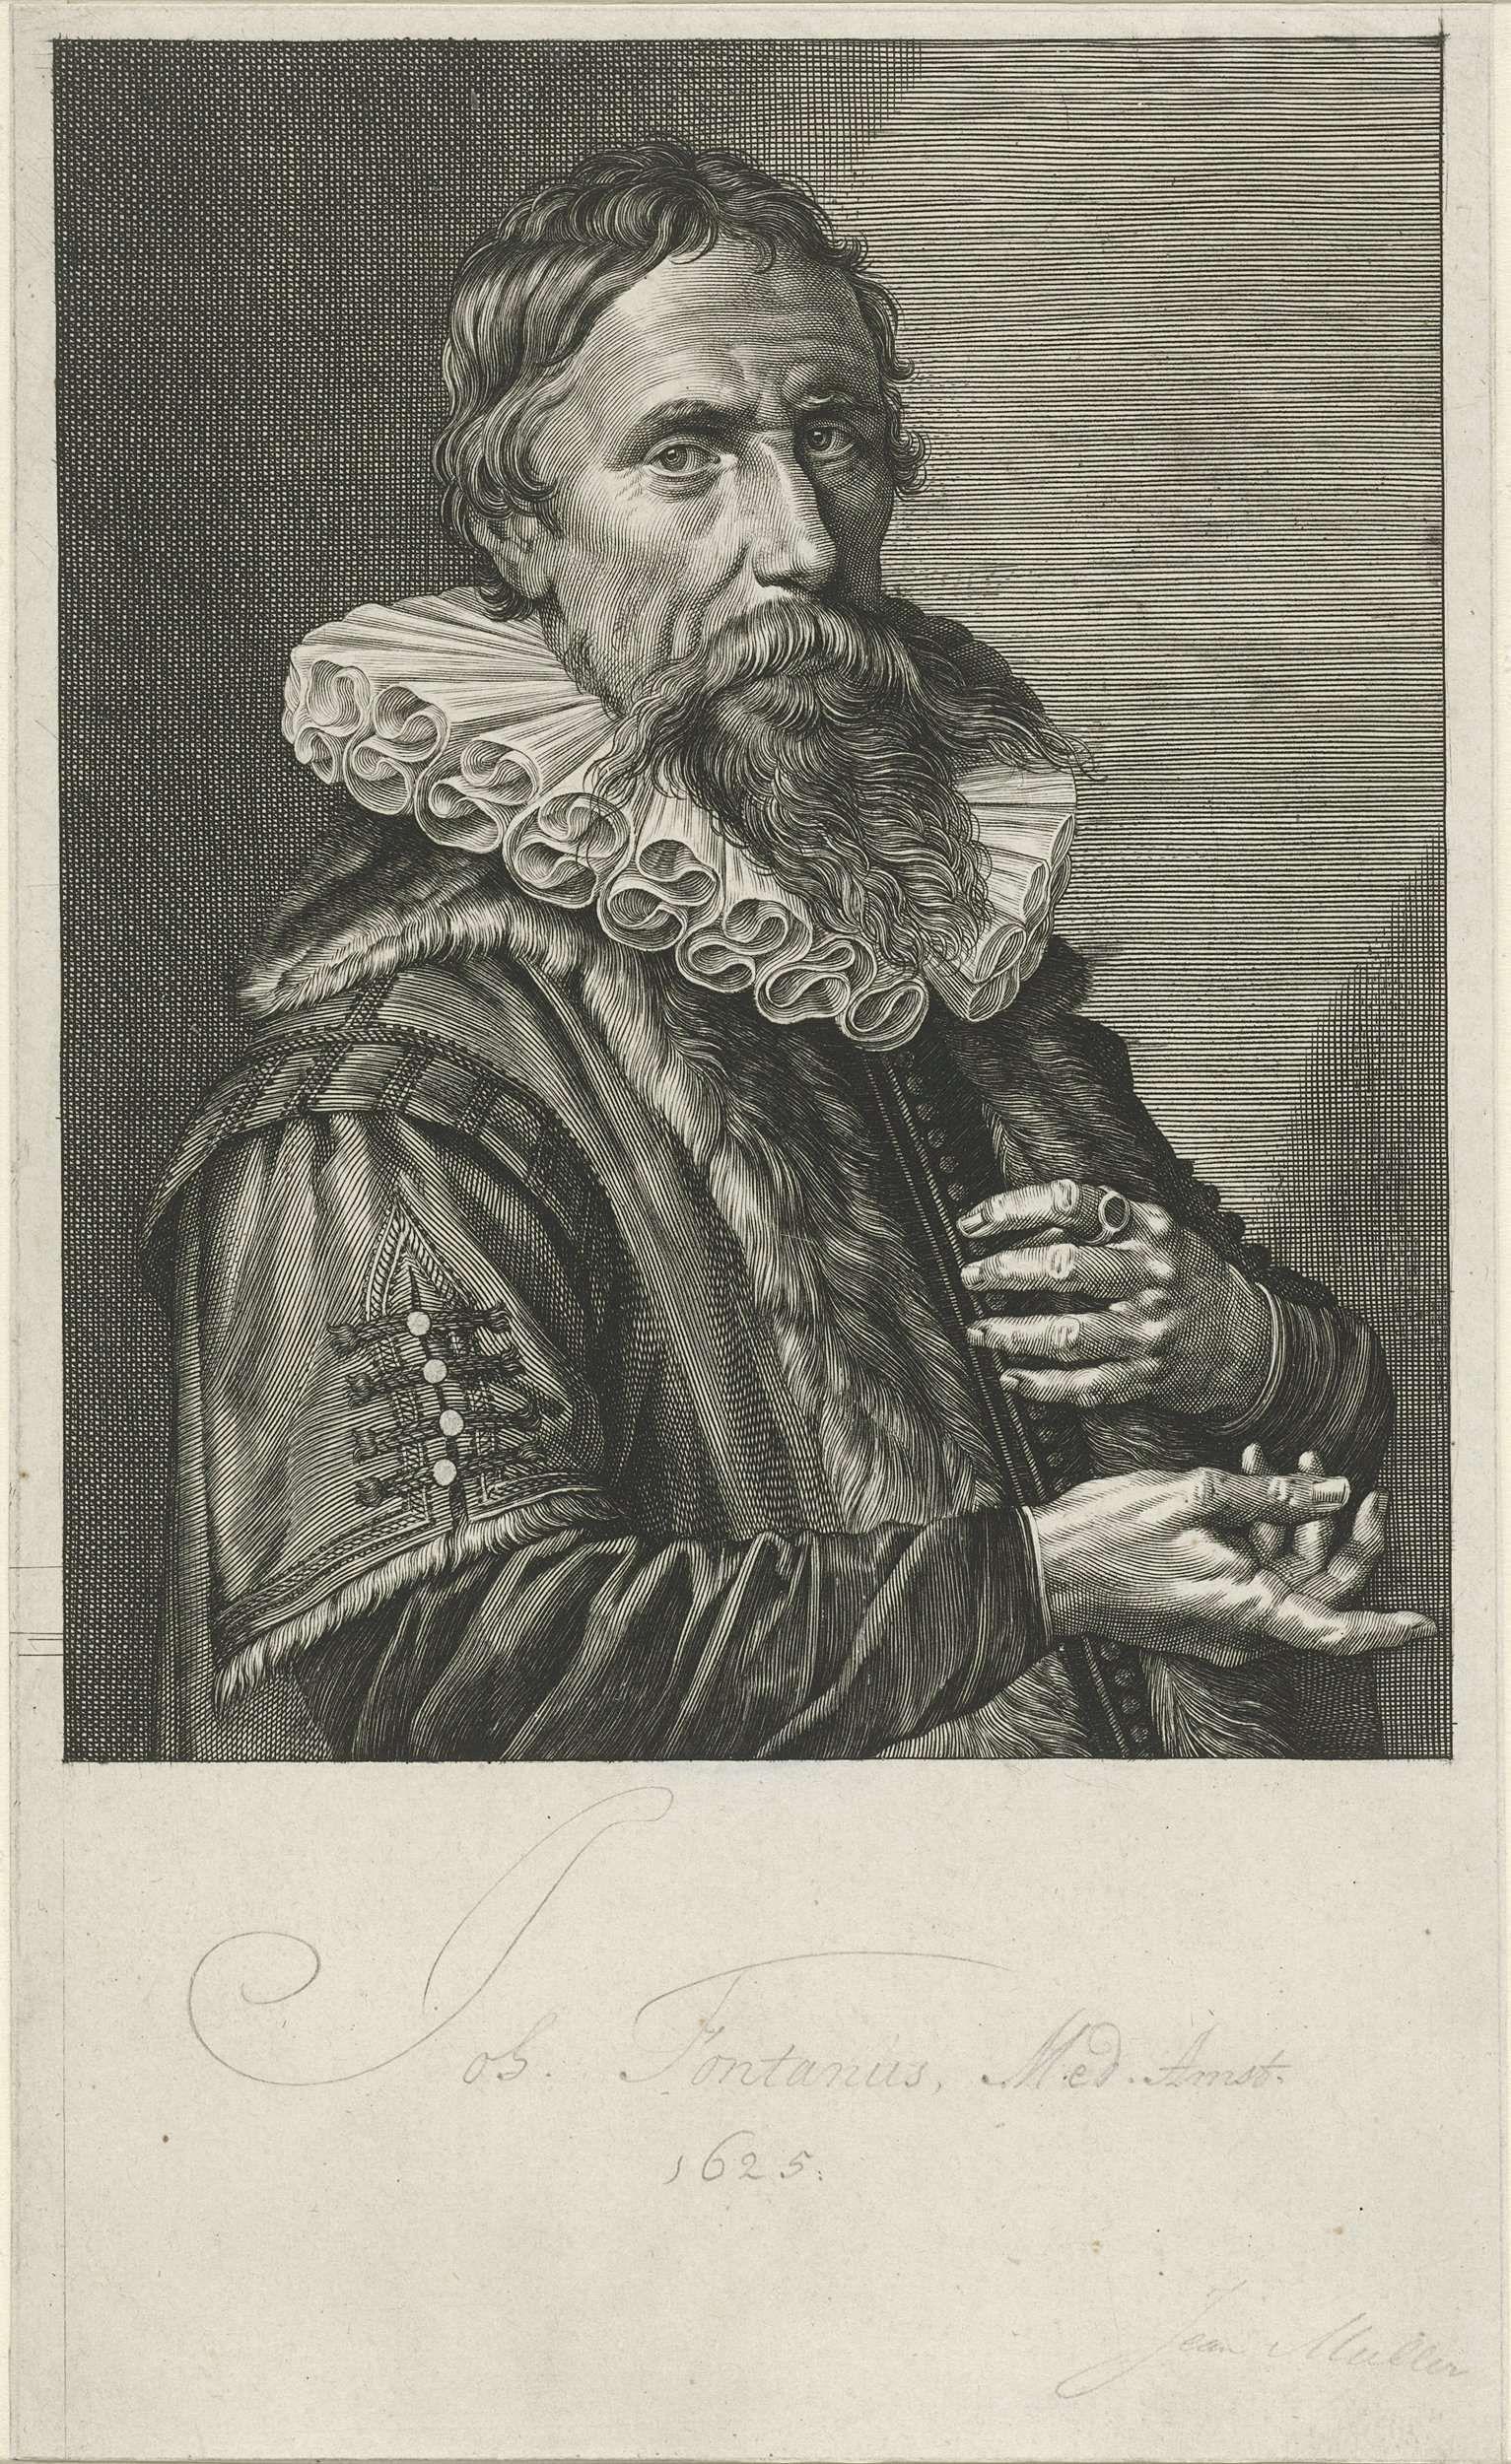 Jan Harmensz. Muller | Portret van Johan Fonteyn, Jan Harmensz. Muller, 1626 | Portret van Johan Fonteyn, arts te Amsterdam.